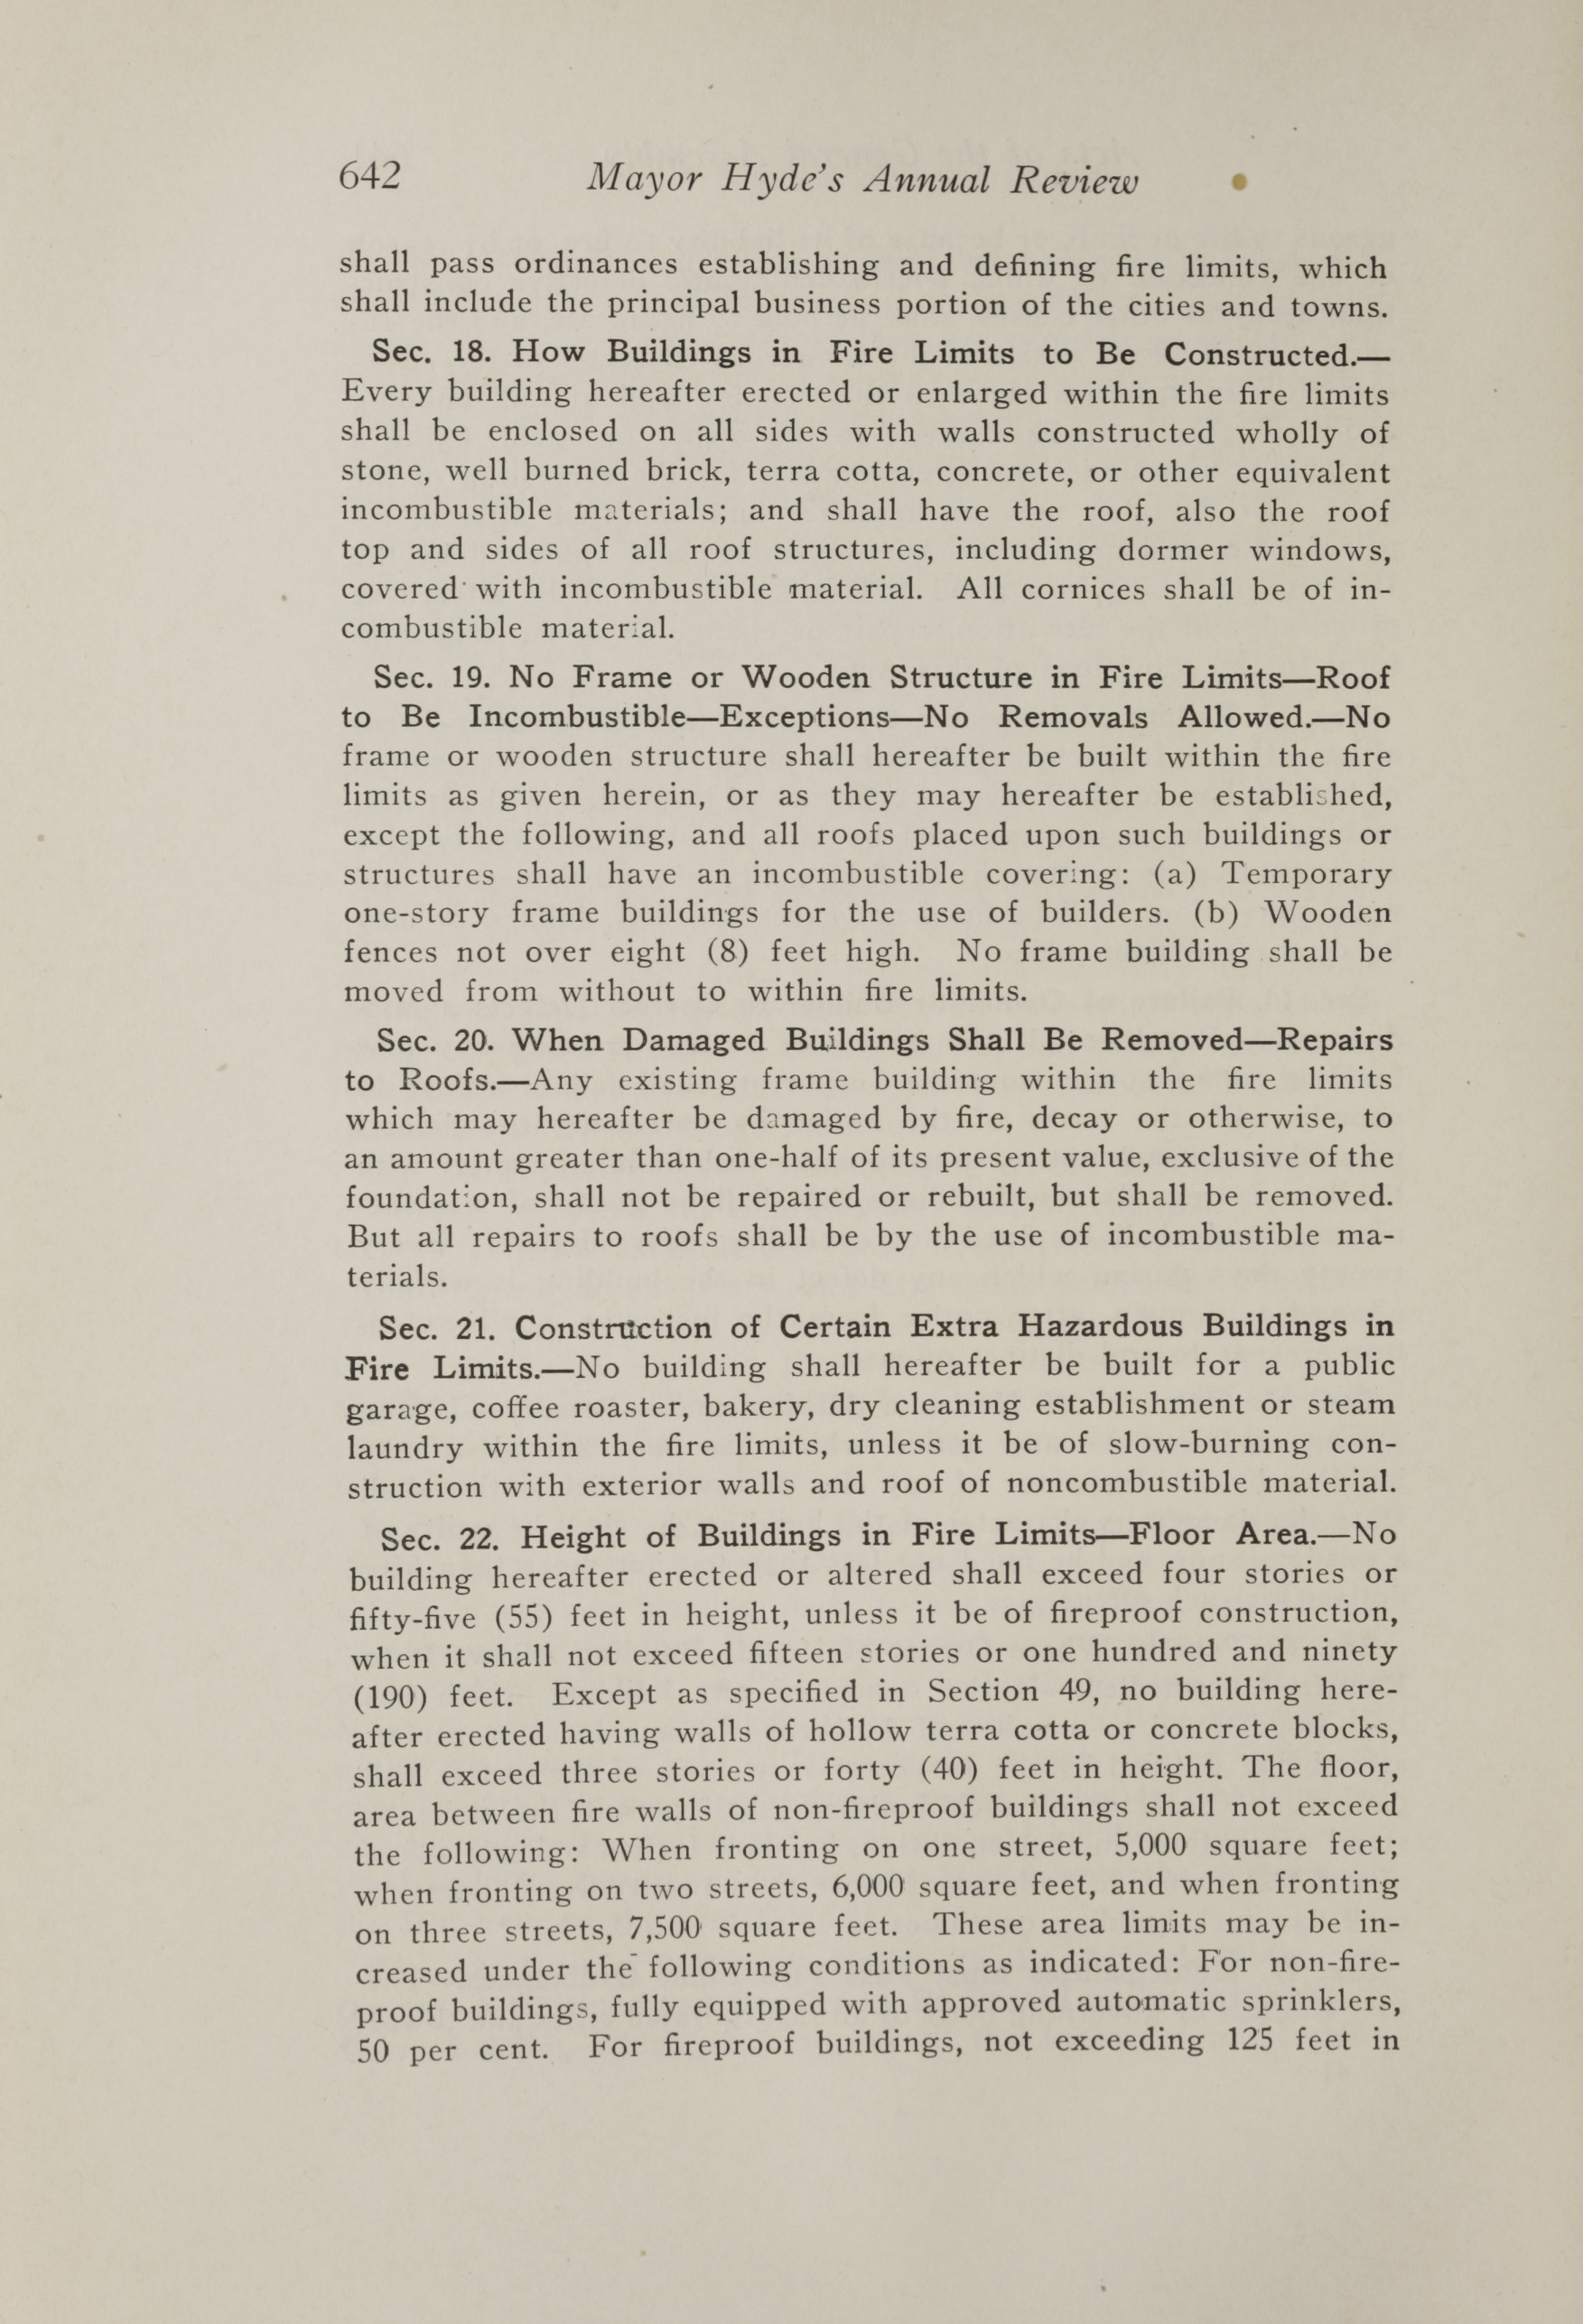 Charleston Yearbook, 1917, page 642